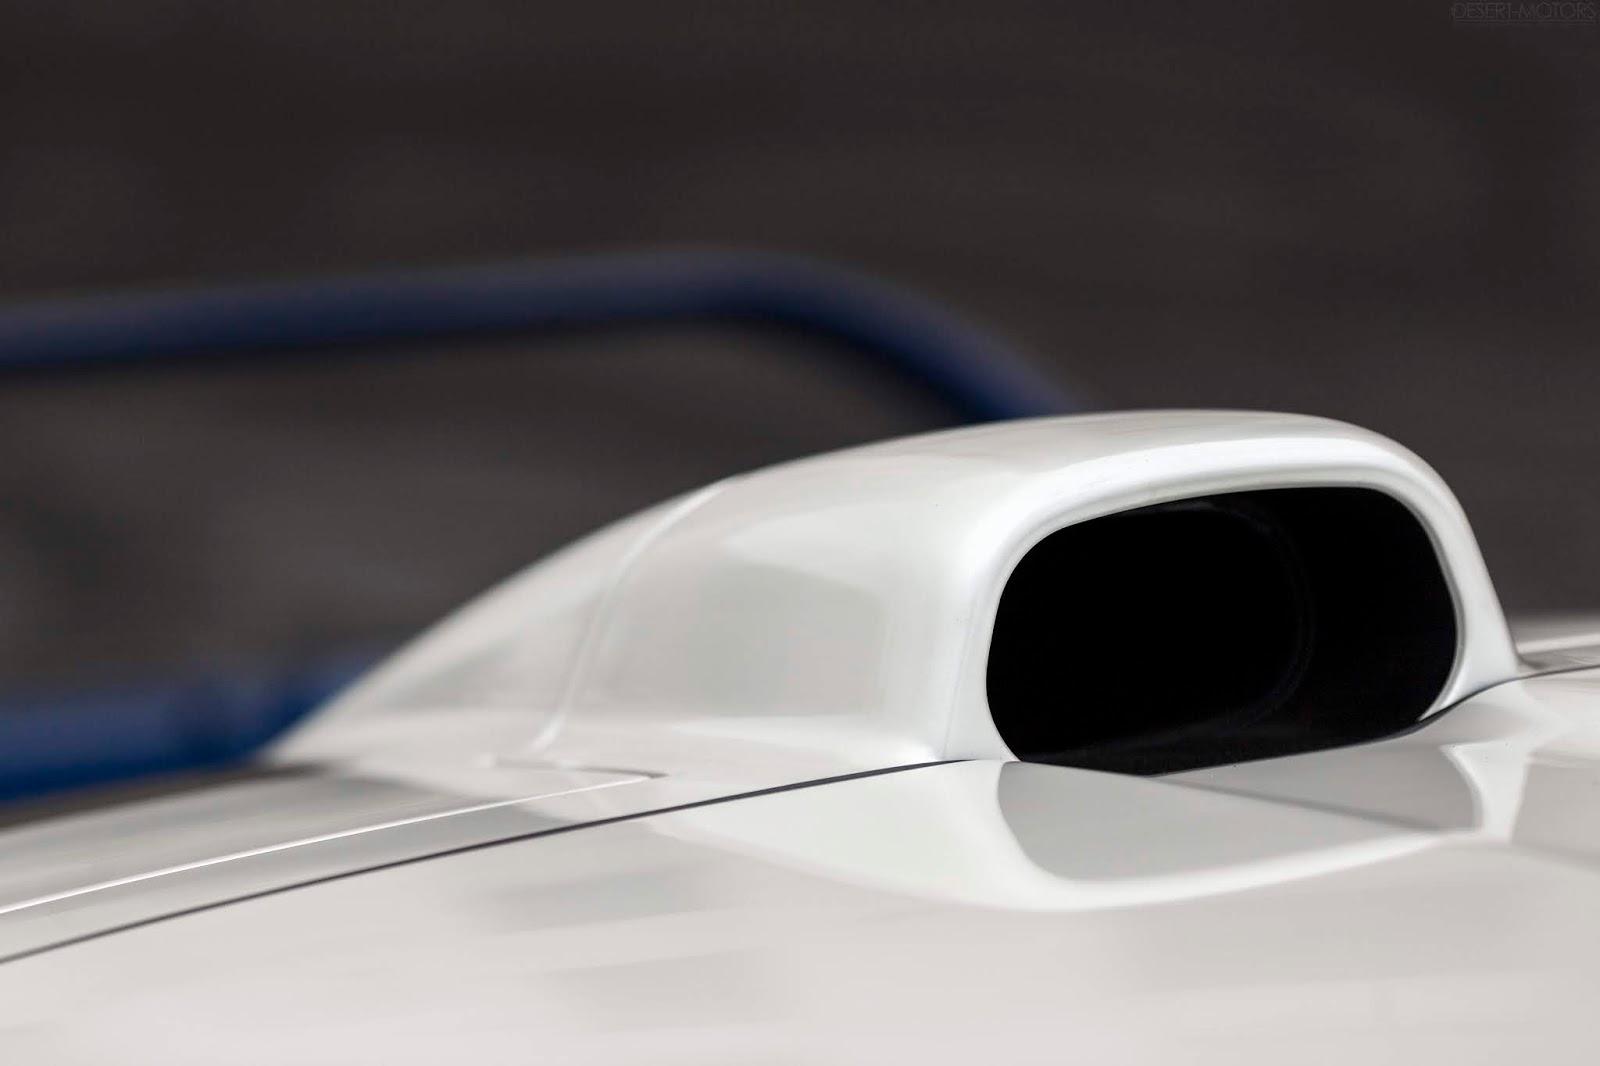 32095398543 1a08290f59 o Maserati MC12. Η Enzo Aperta. Maserati, Maserati MC12, MC12, retrocar, retrocar sunday, zblog